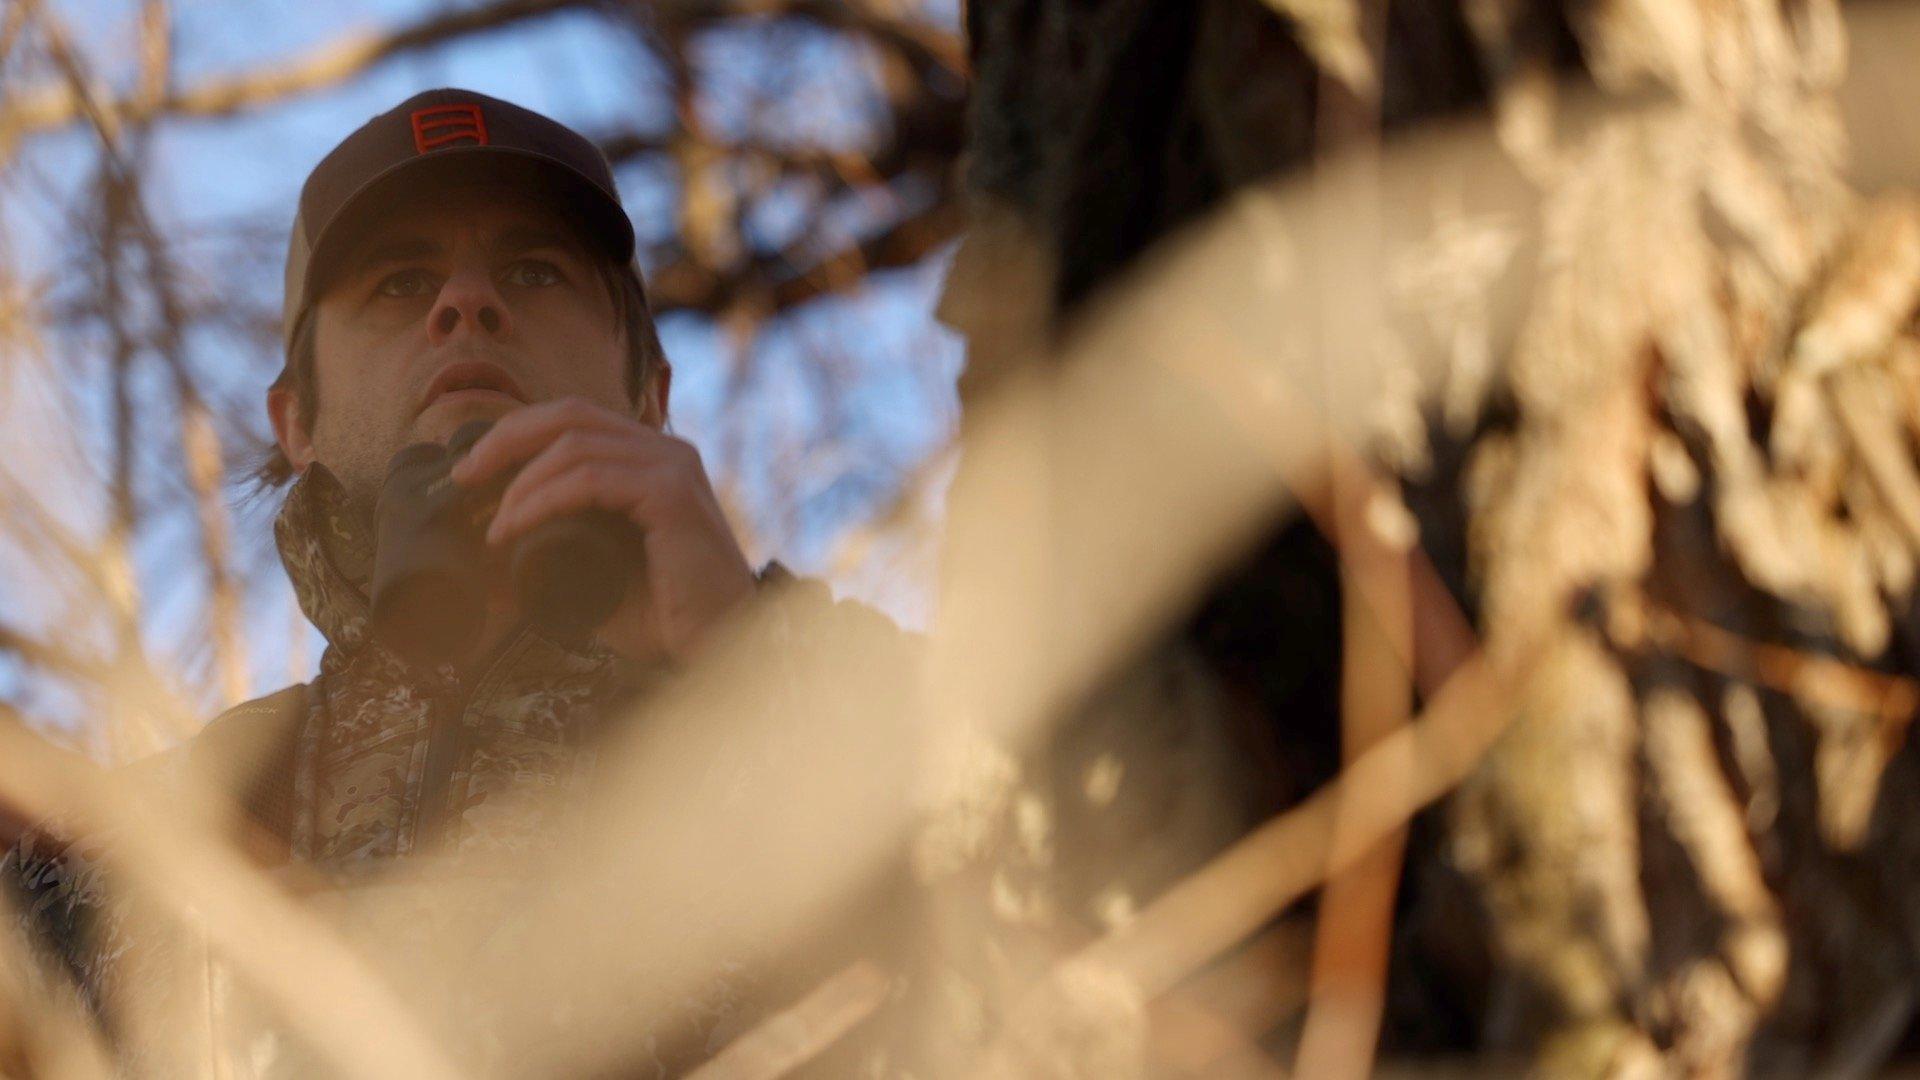 Blake Glassing On A Tree (3)